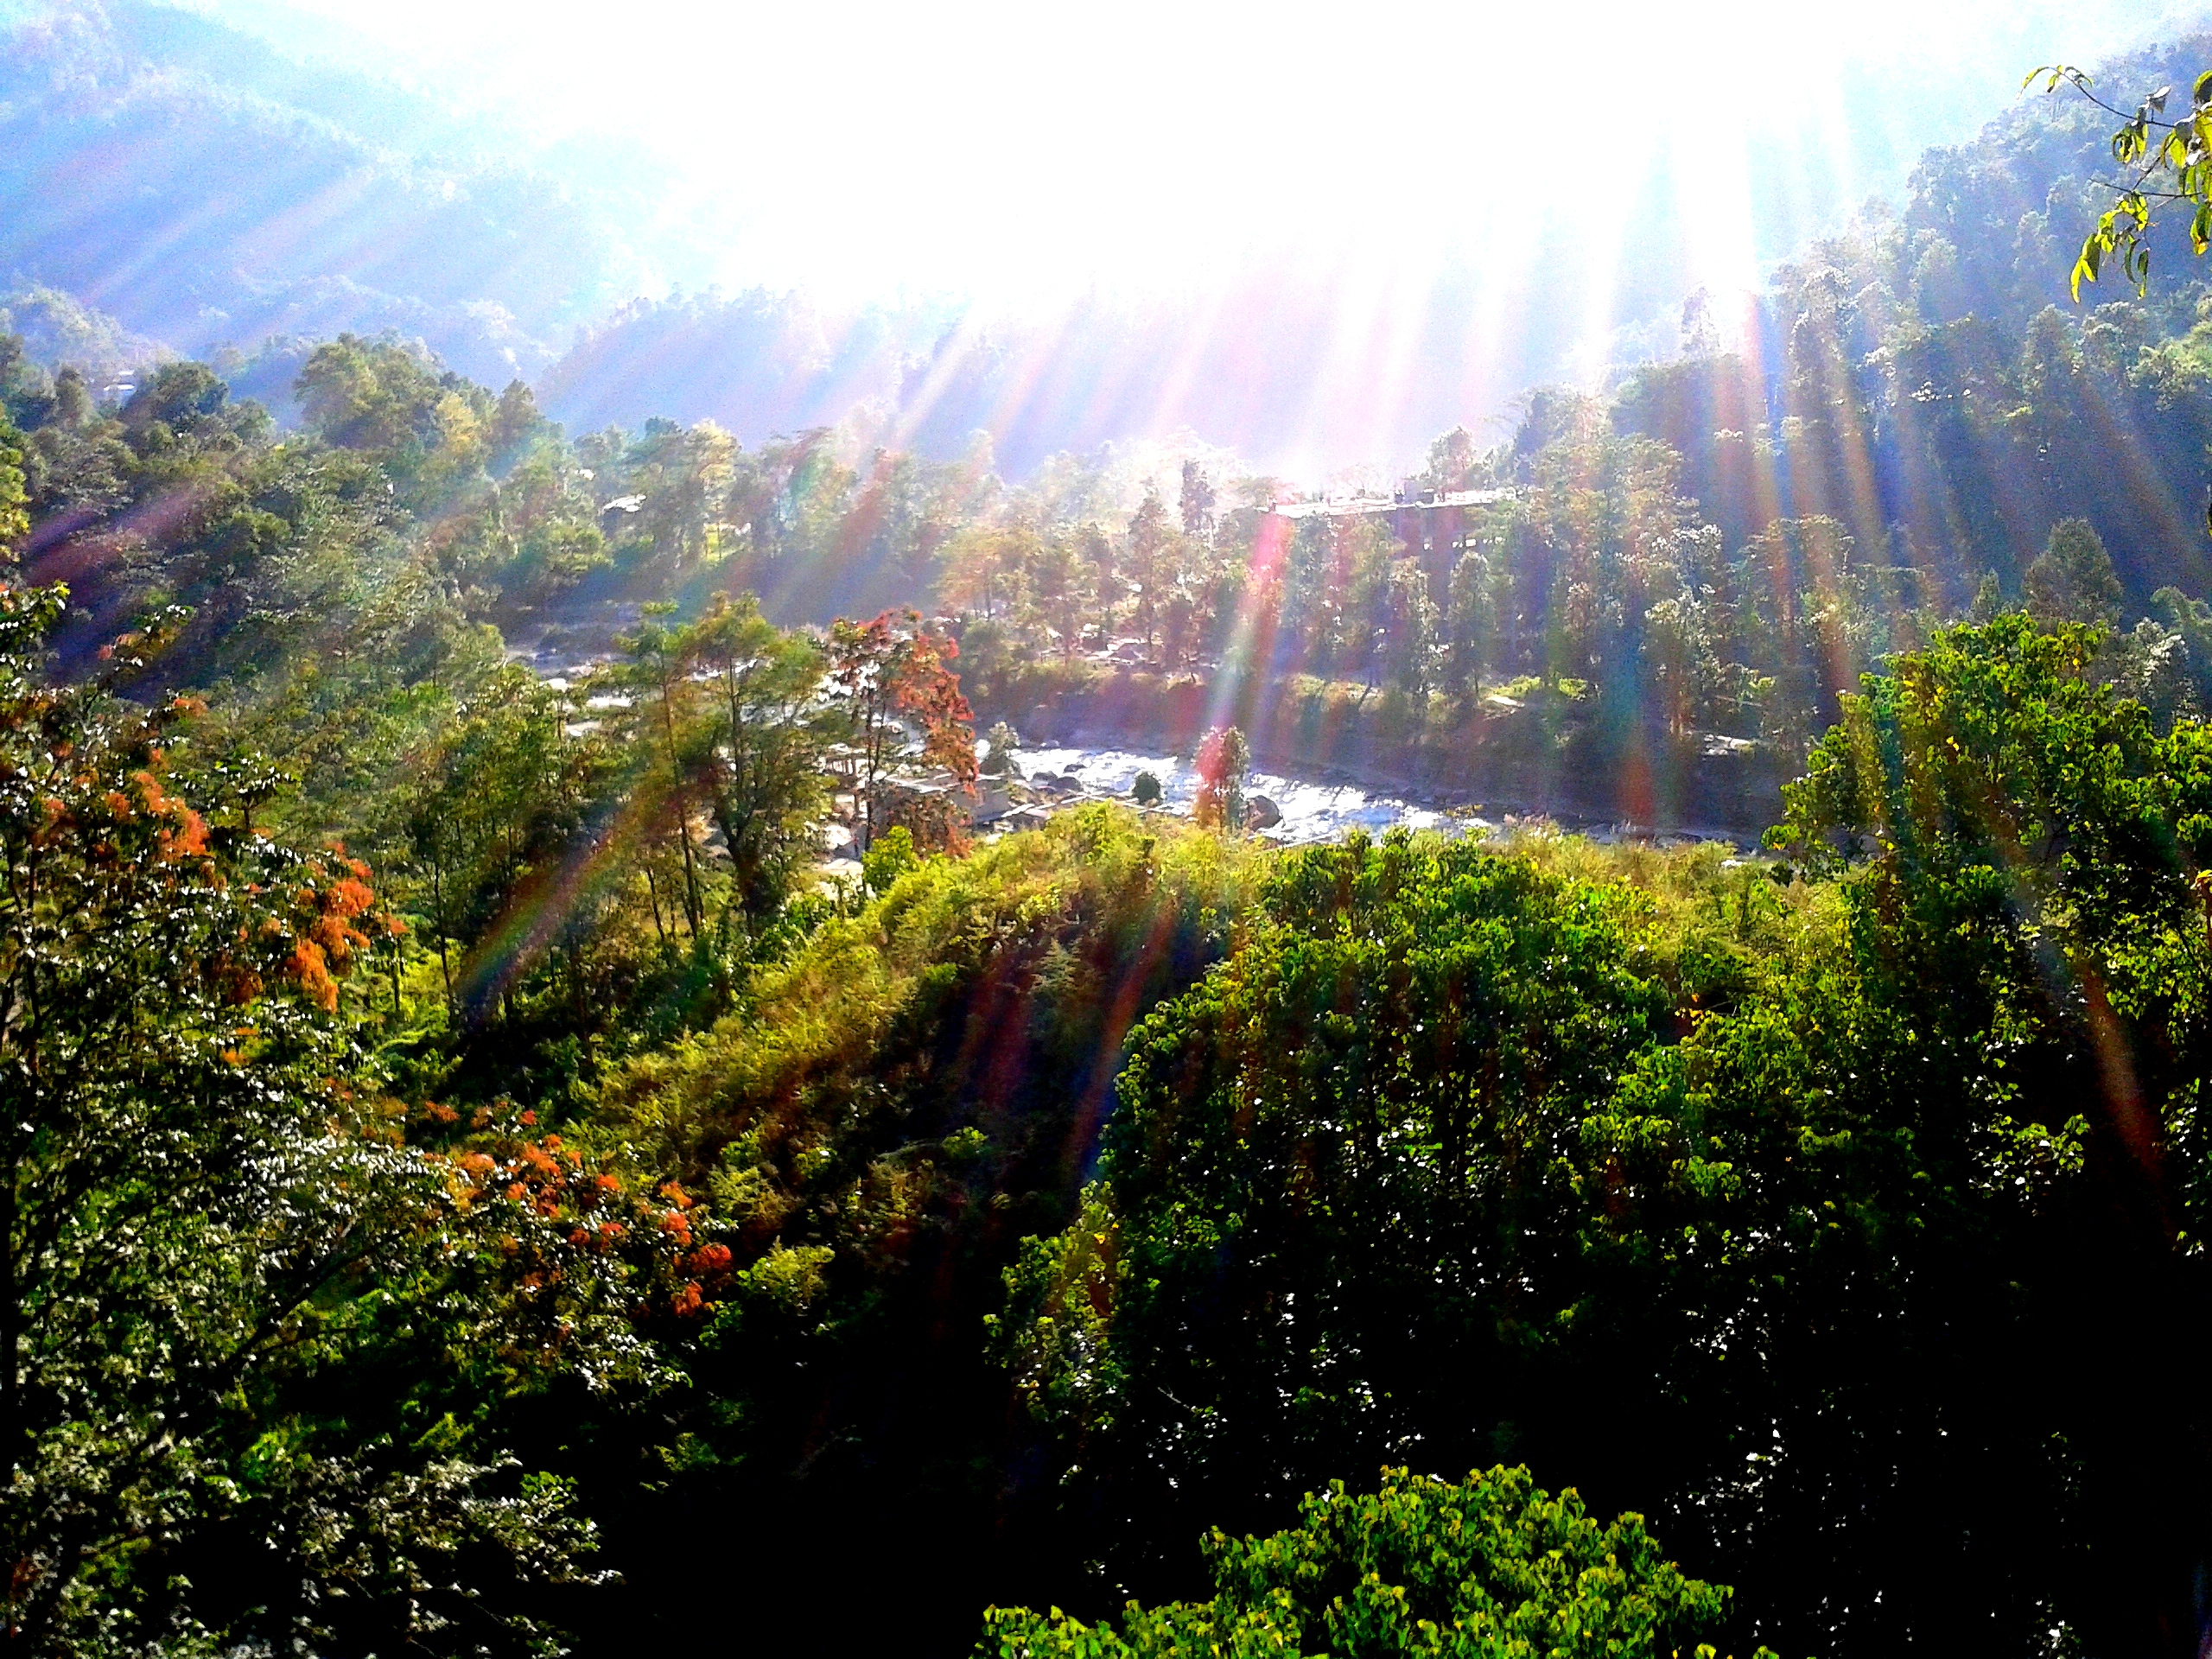 summer in Sikkim, best time for honeymoon